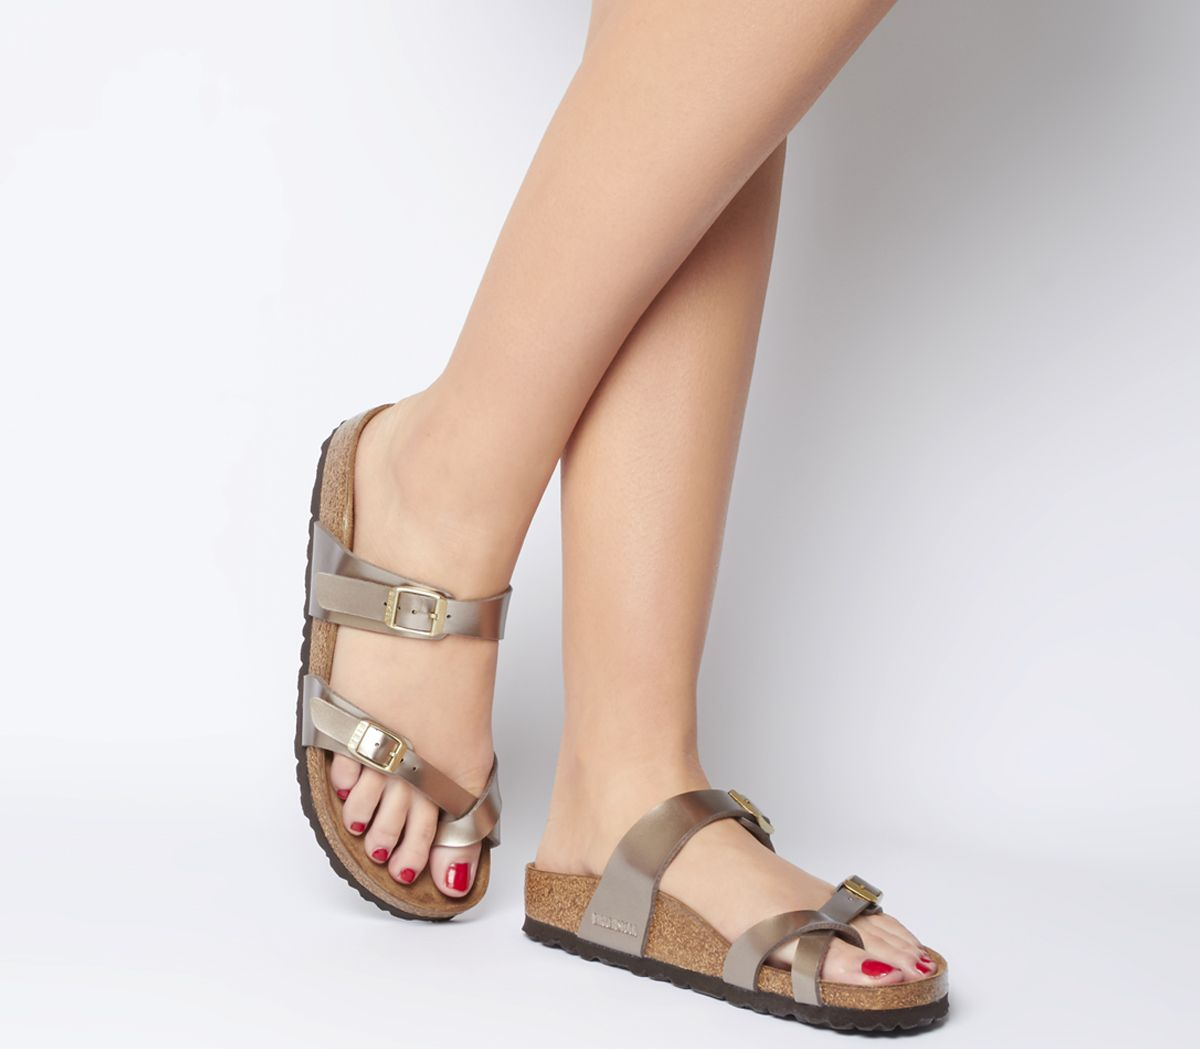 e24c5069a Birkenstock Mayari Cross Strap Sandals Electric Metallic Taupe - Sandals